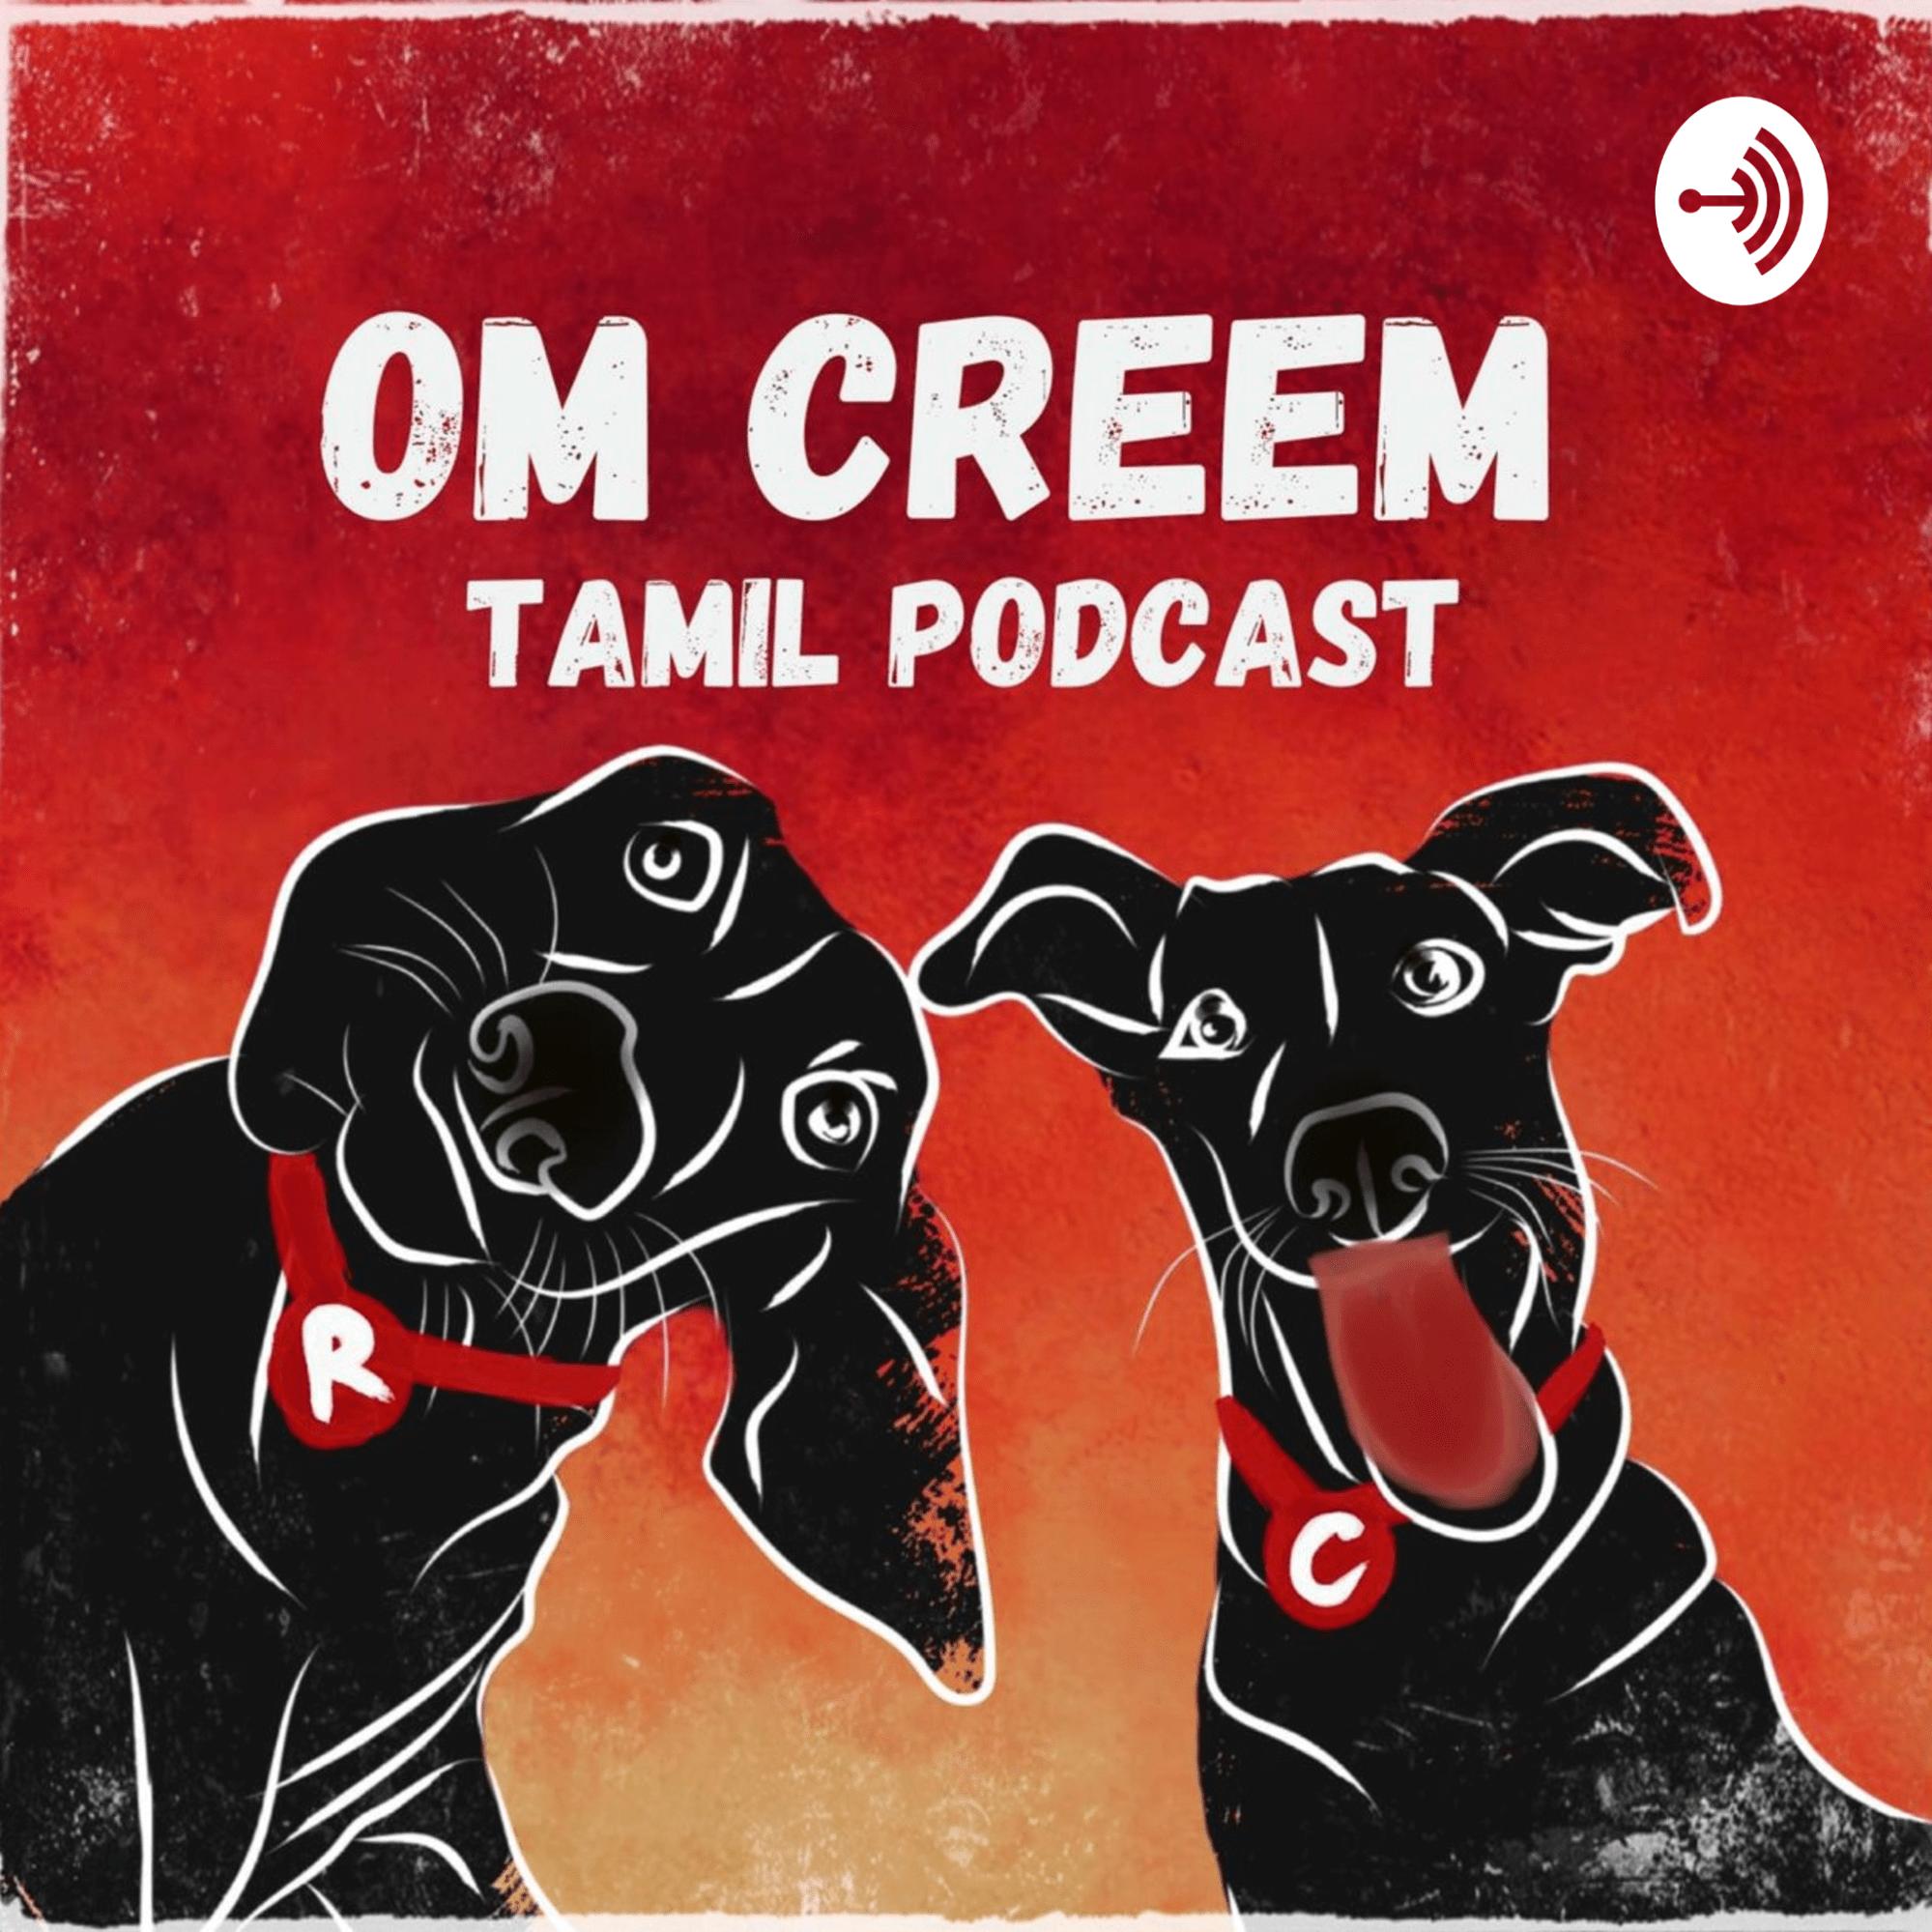 om creem tamil podcast